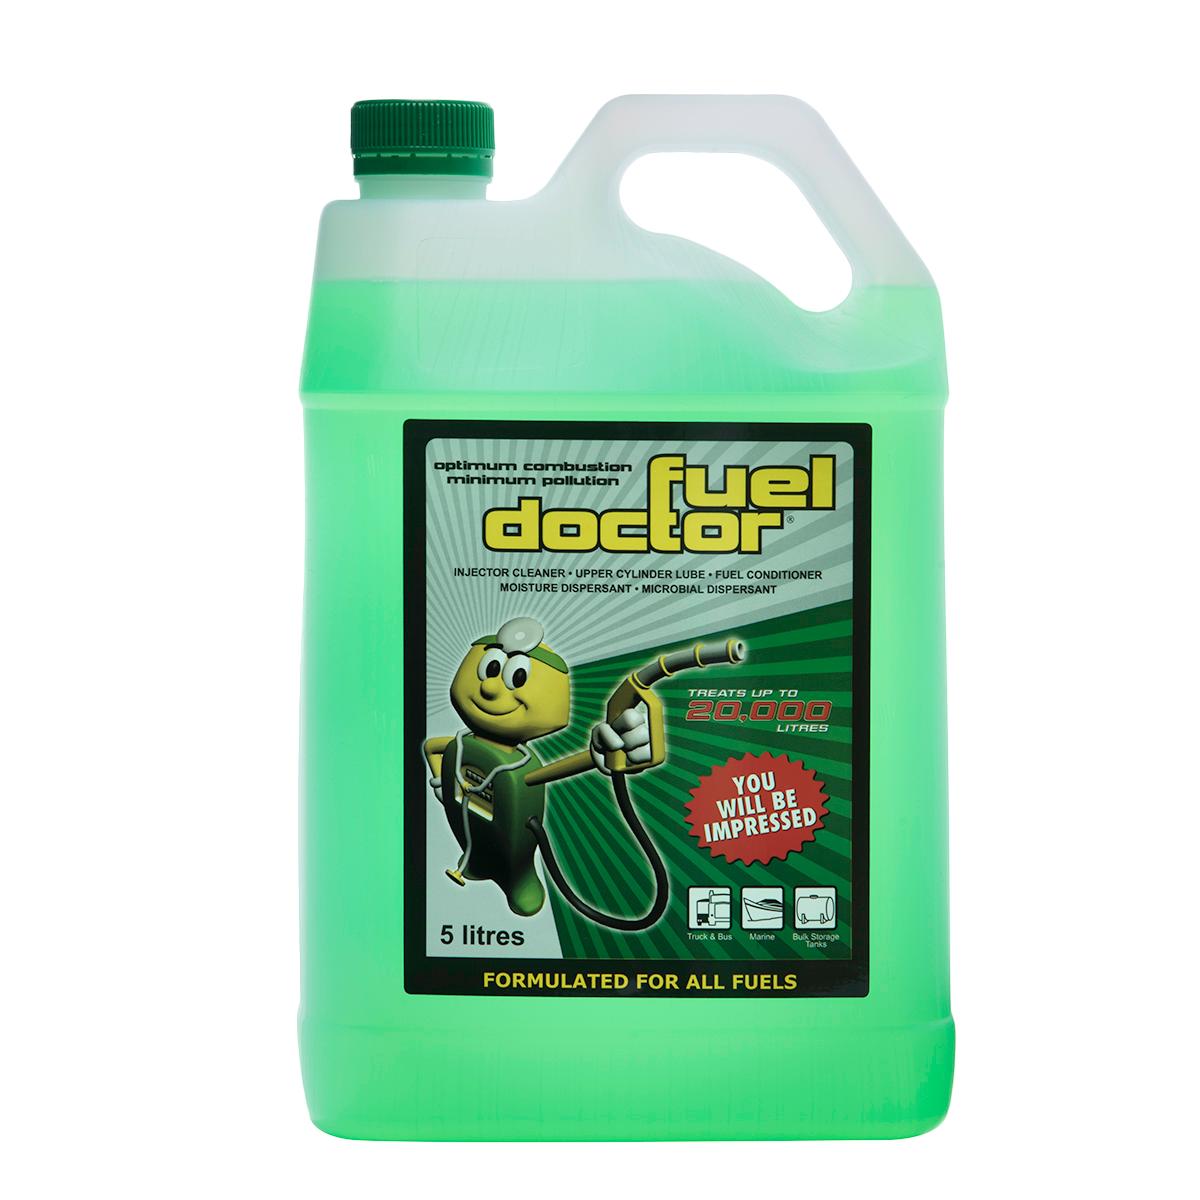 Fuel Doctor Fuel Conditioner 5L Bottle